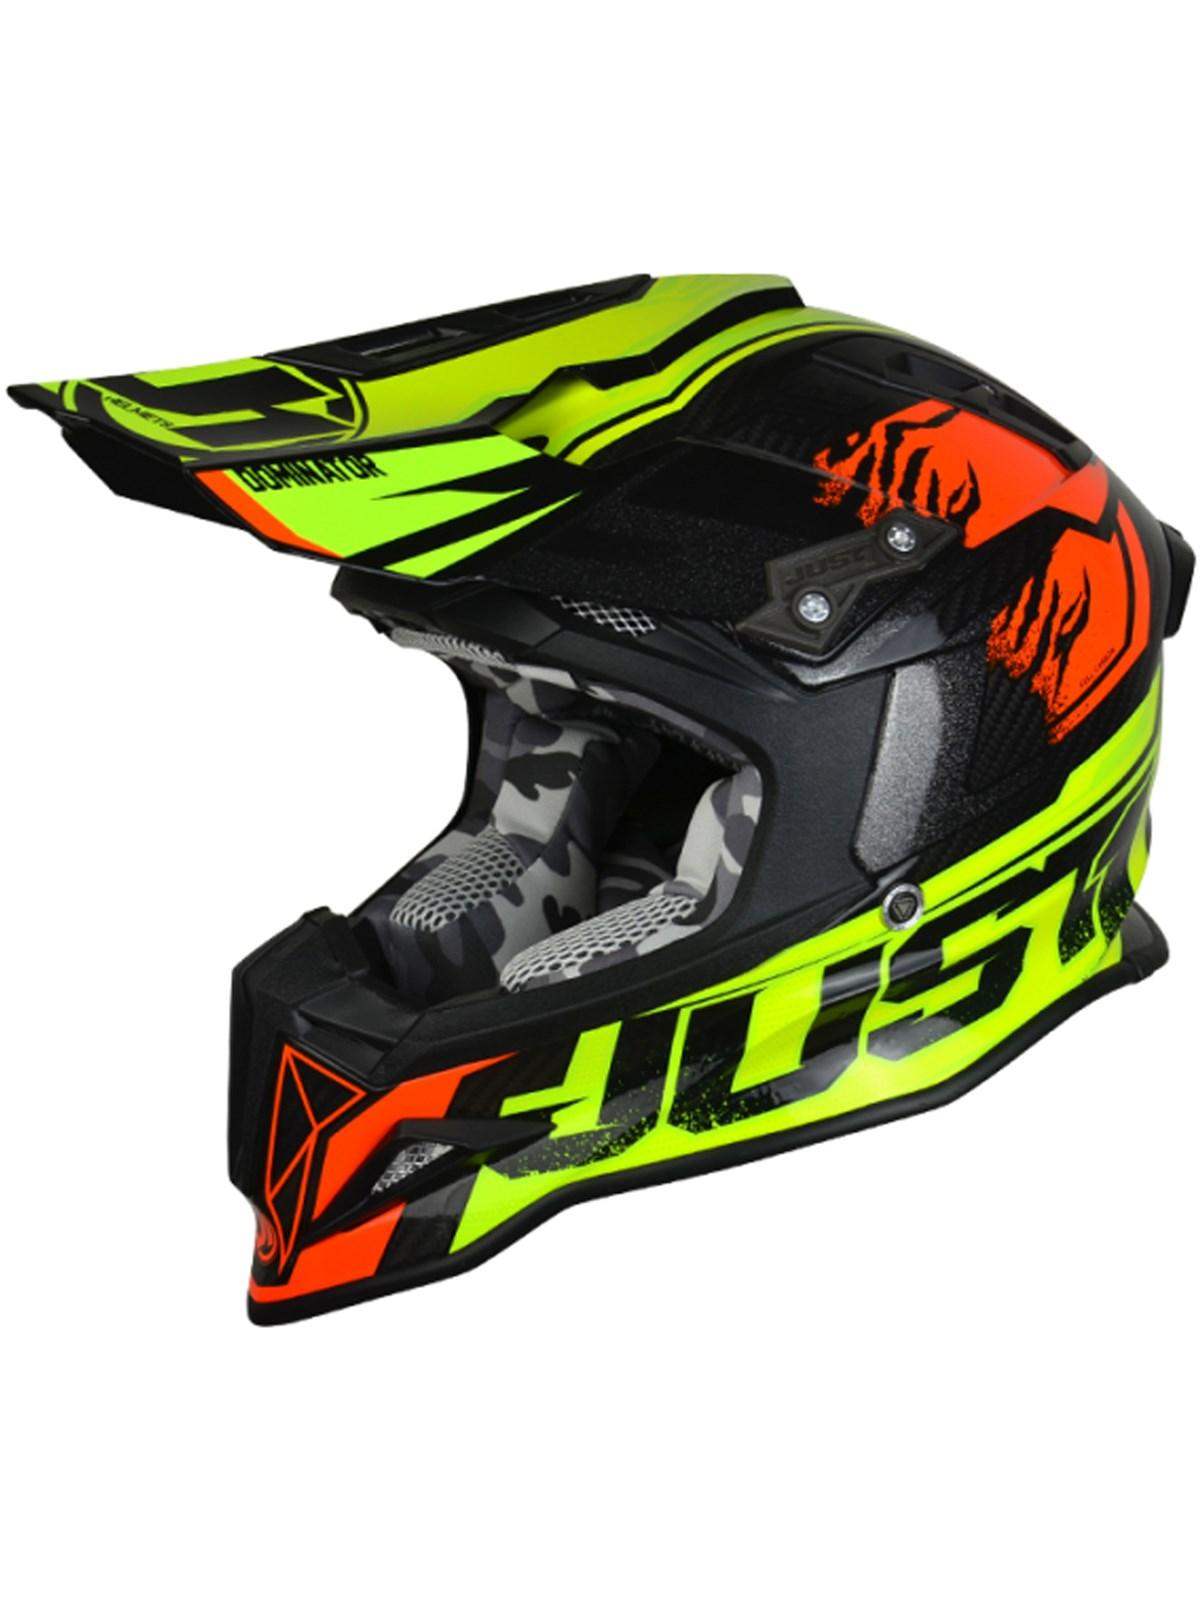 Just 1 Helmets